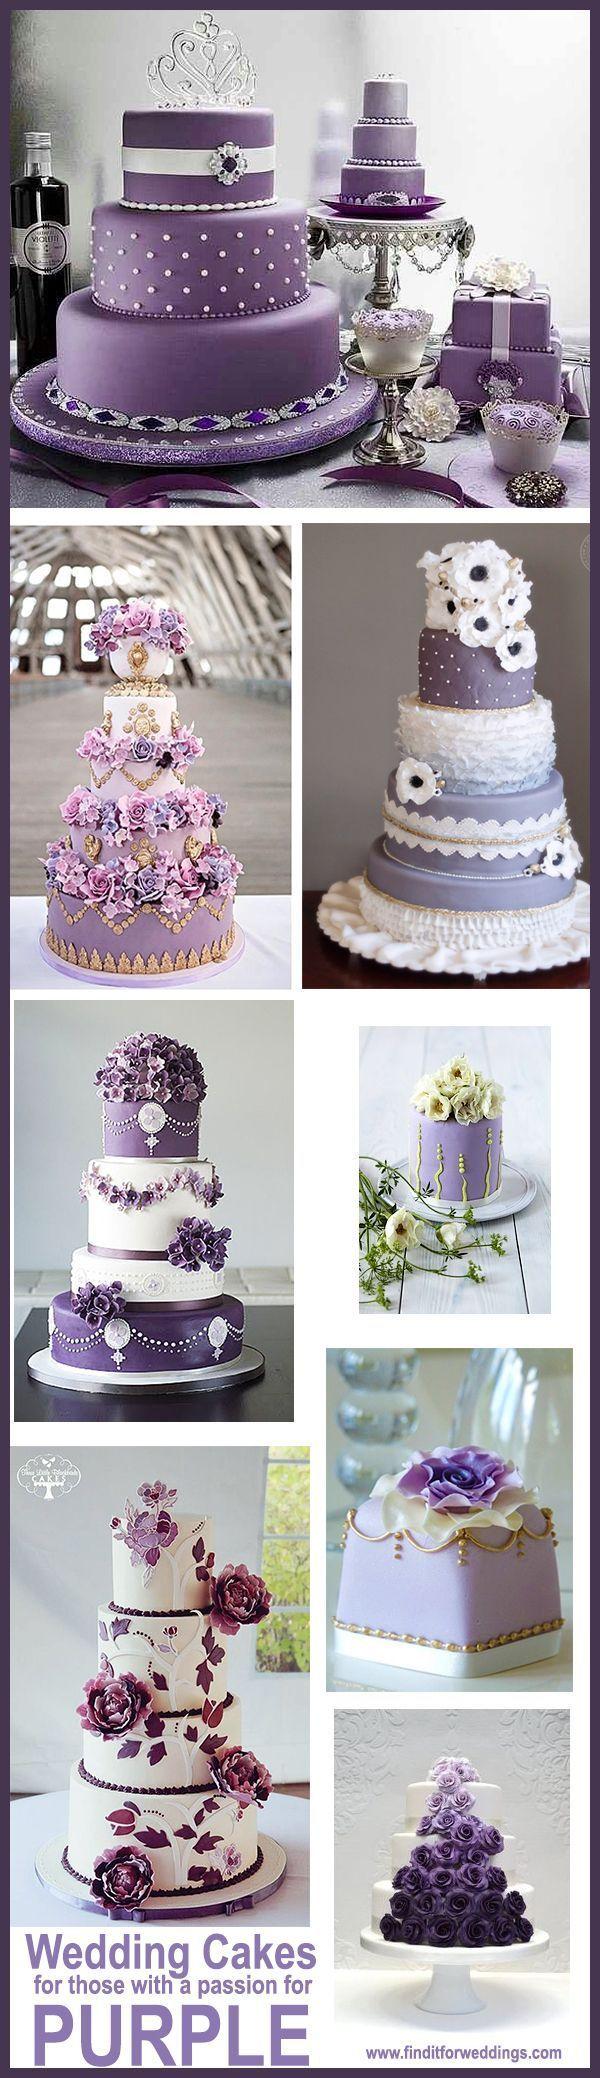 This months favorite purple wedding cakes - FindItforWeddings FindItforWeddings #purpleweddingcakes